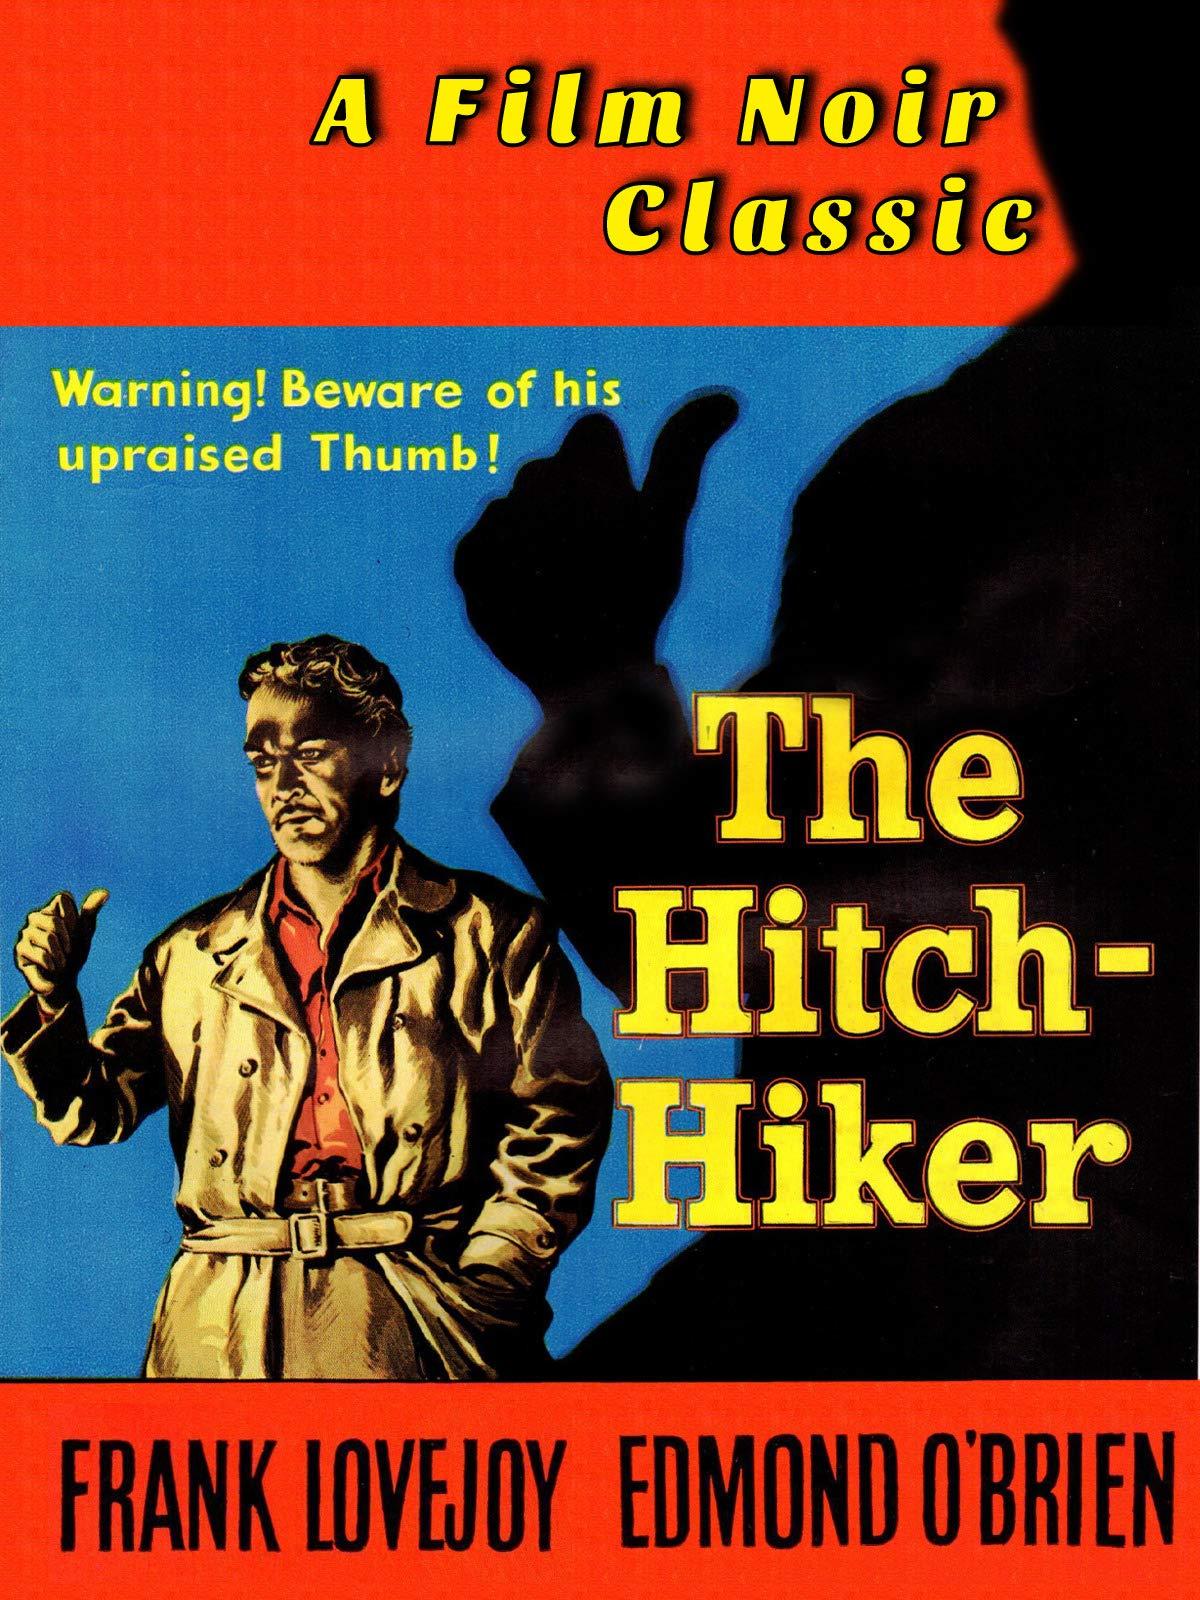 The Hitch-Hiker - Edmund O'Brien, Frank Lovejoy, A Film Noir Classic on Amazon Prime Video UK